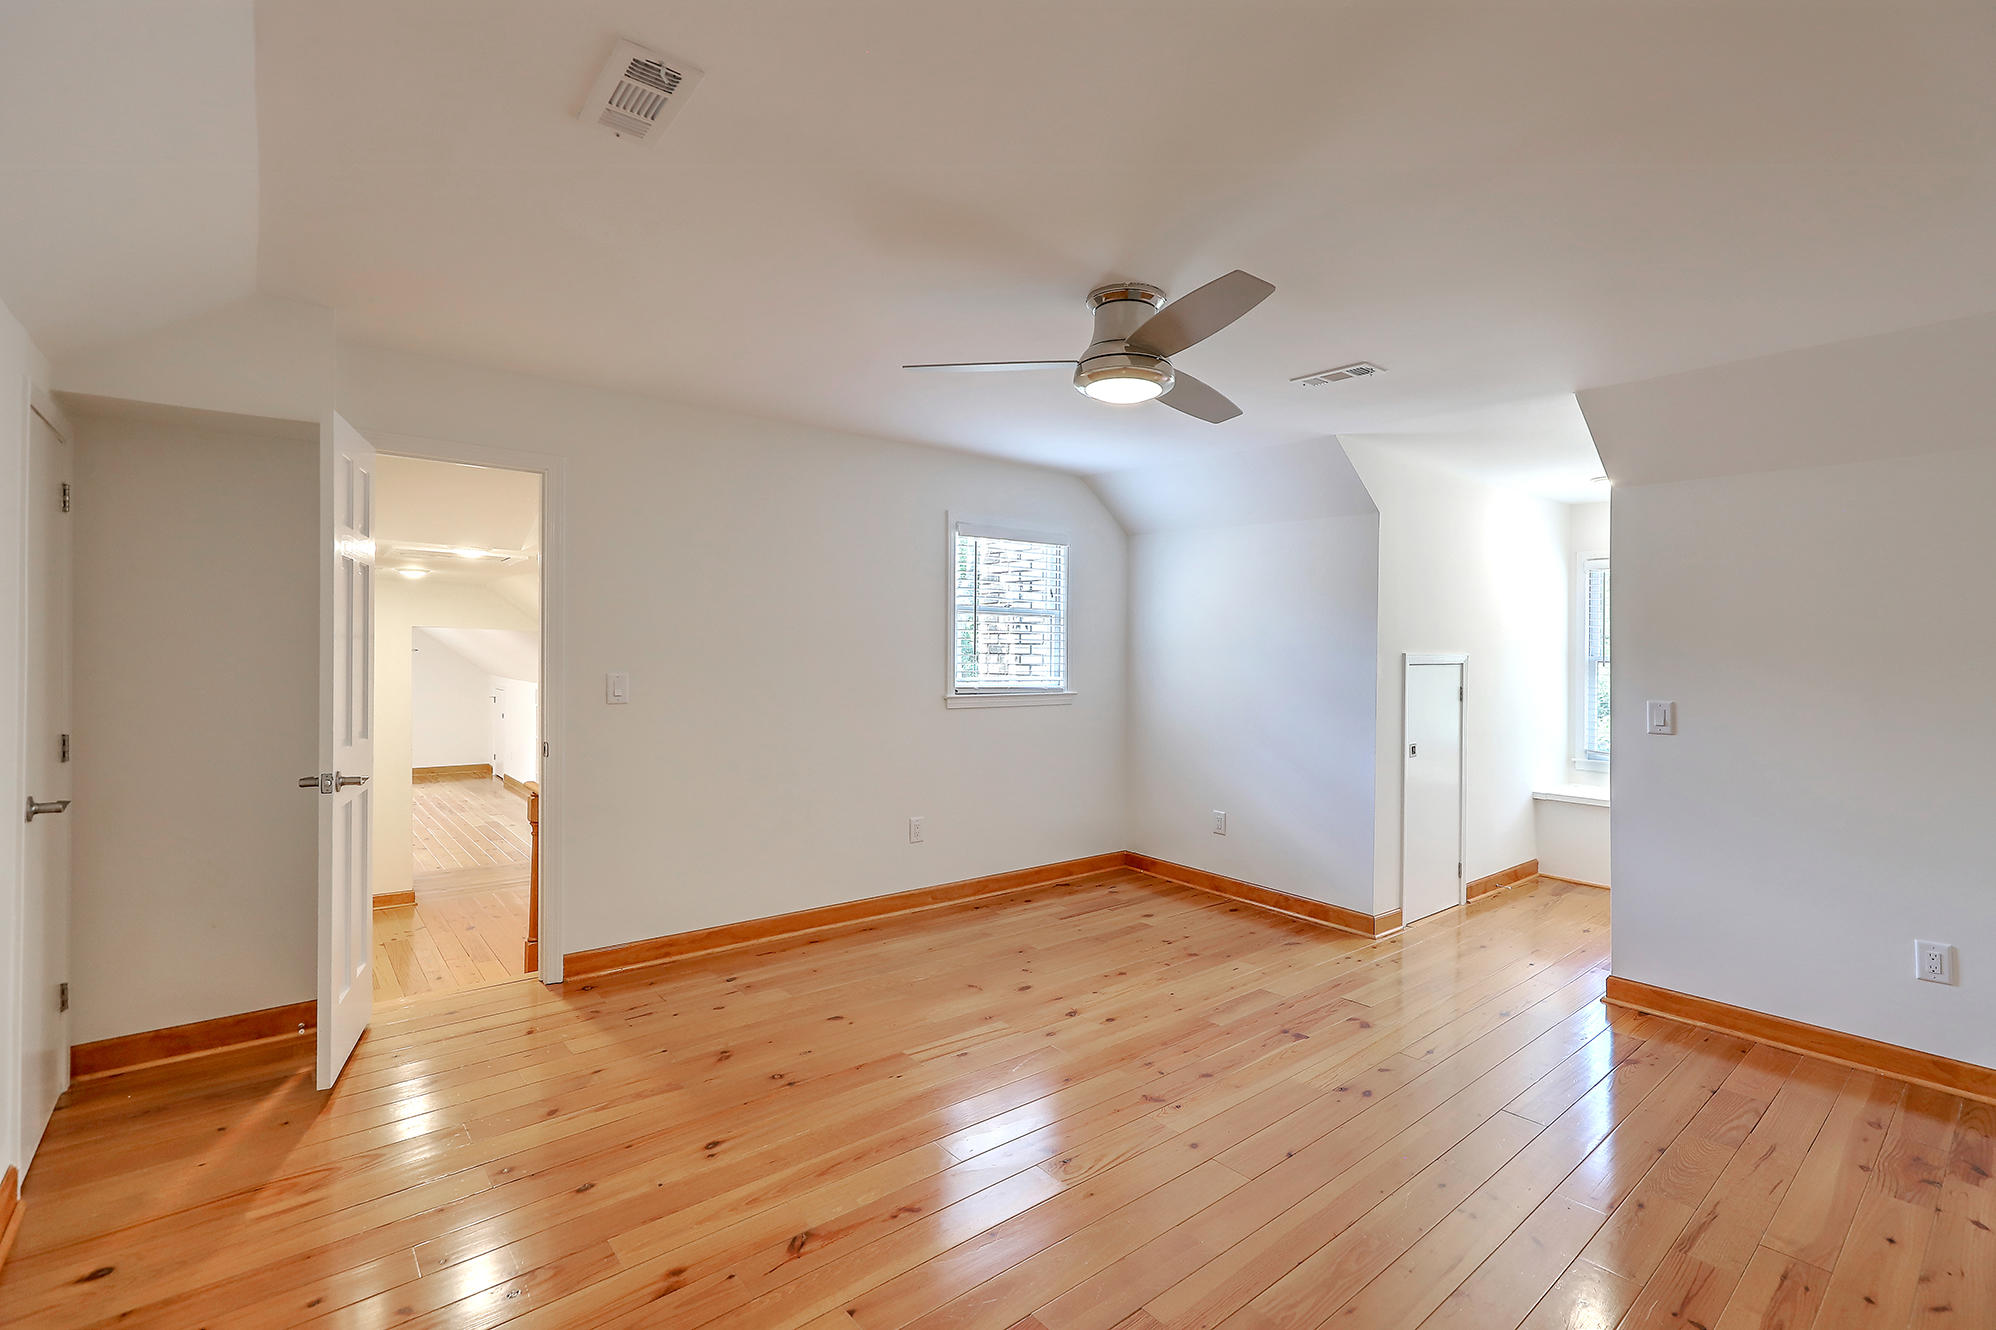 Edgewater Park Homes For Sale - 1413 Edsent, Charleston, SC - 18